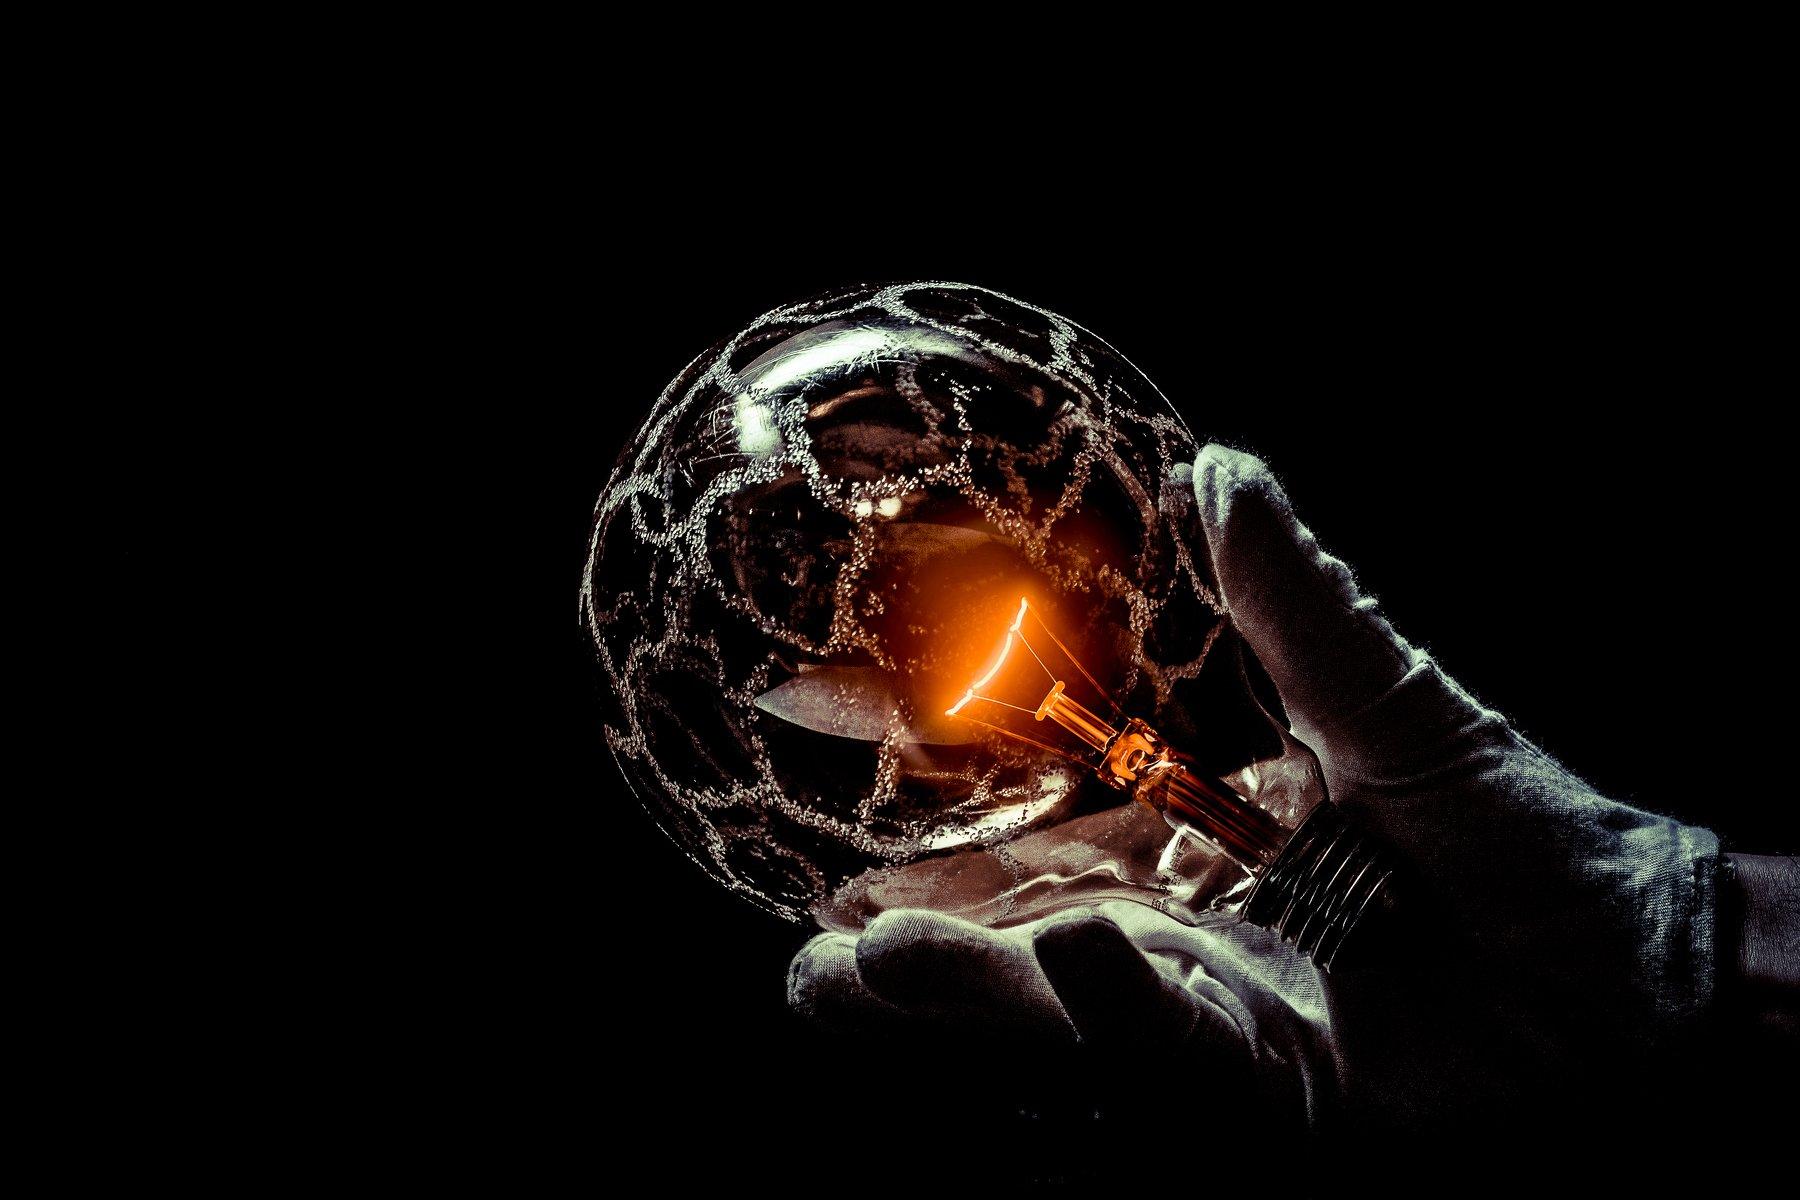 hand, glass, bulb, macro, conceptual, concept, art, light, globes, round, ebergy, Antonio Bernardino